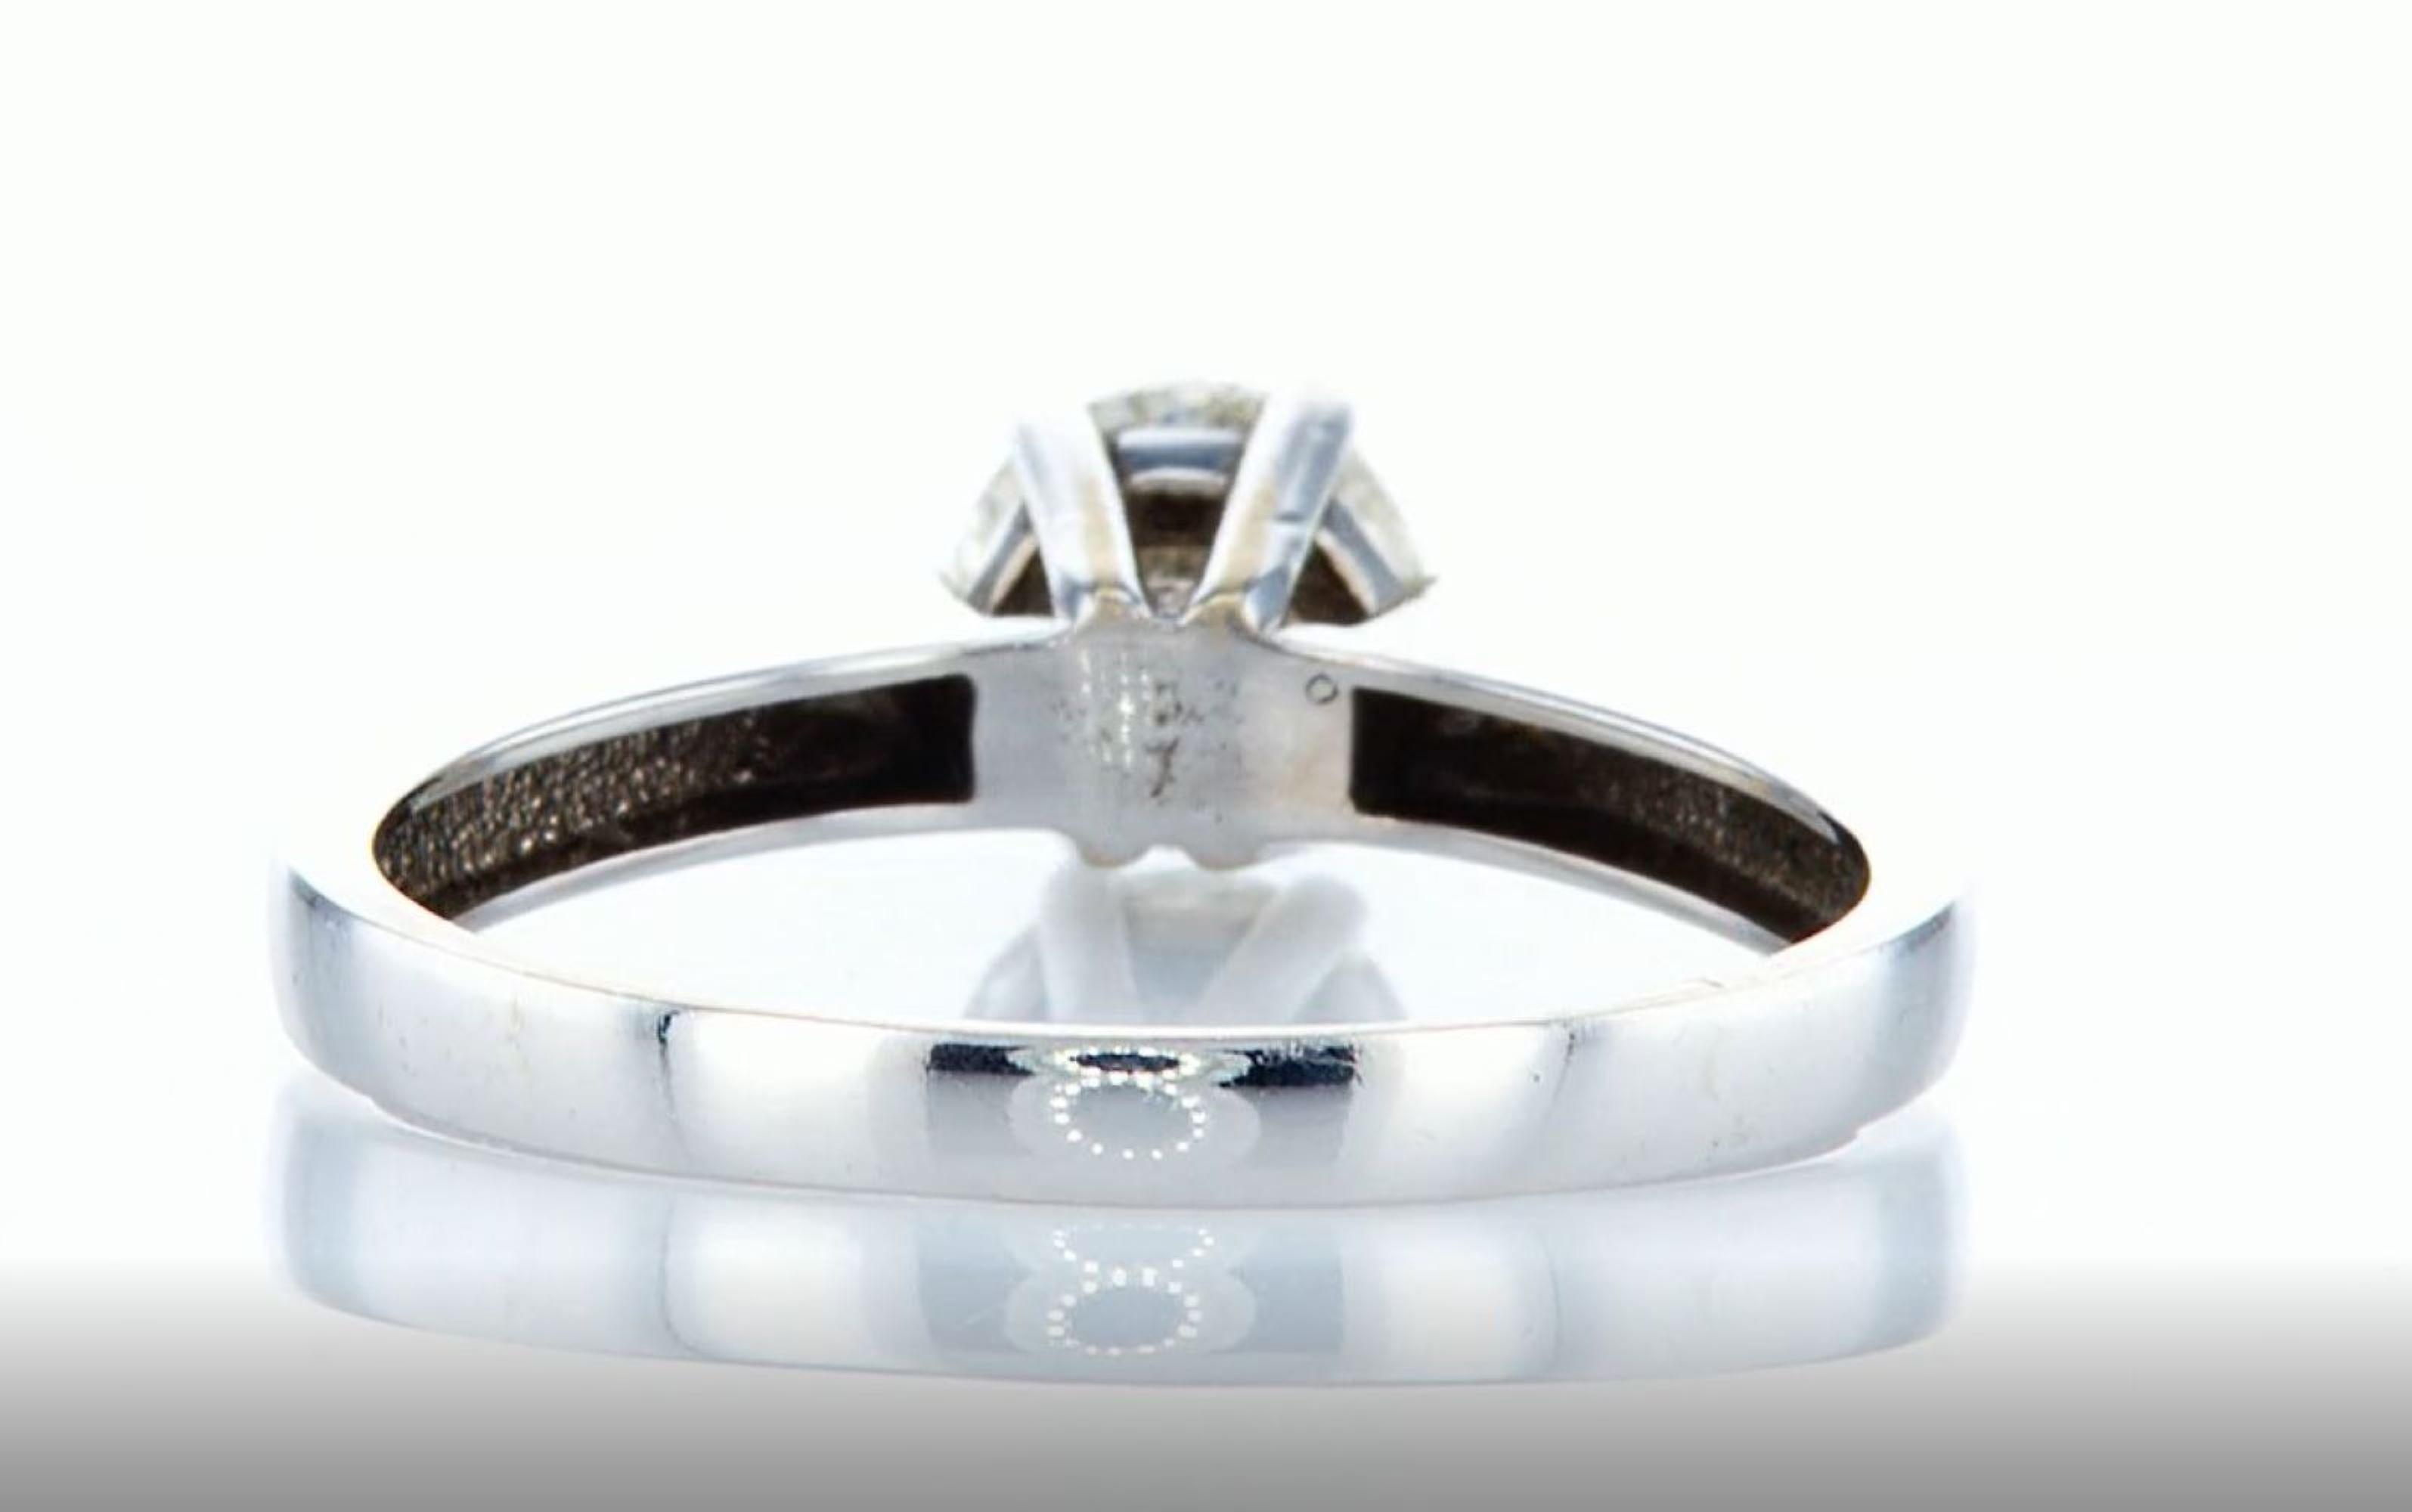 14K White gold ring 1.05CTW - Image 4 of 7